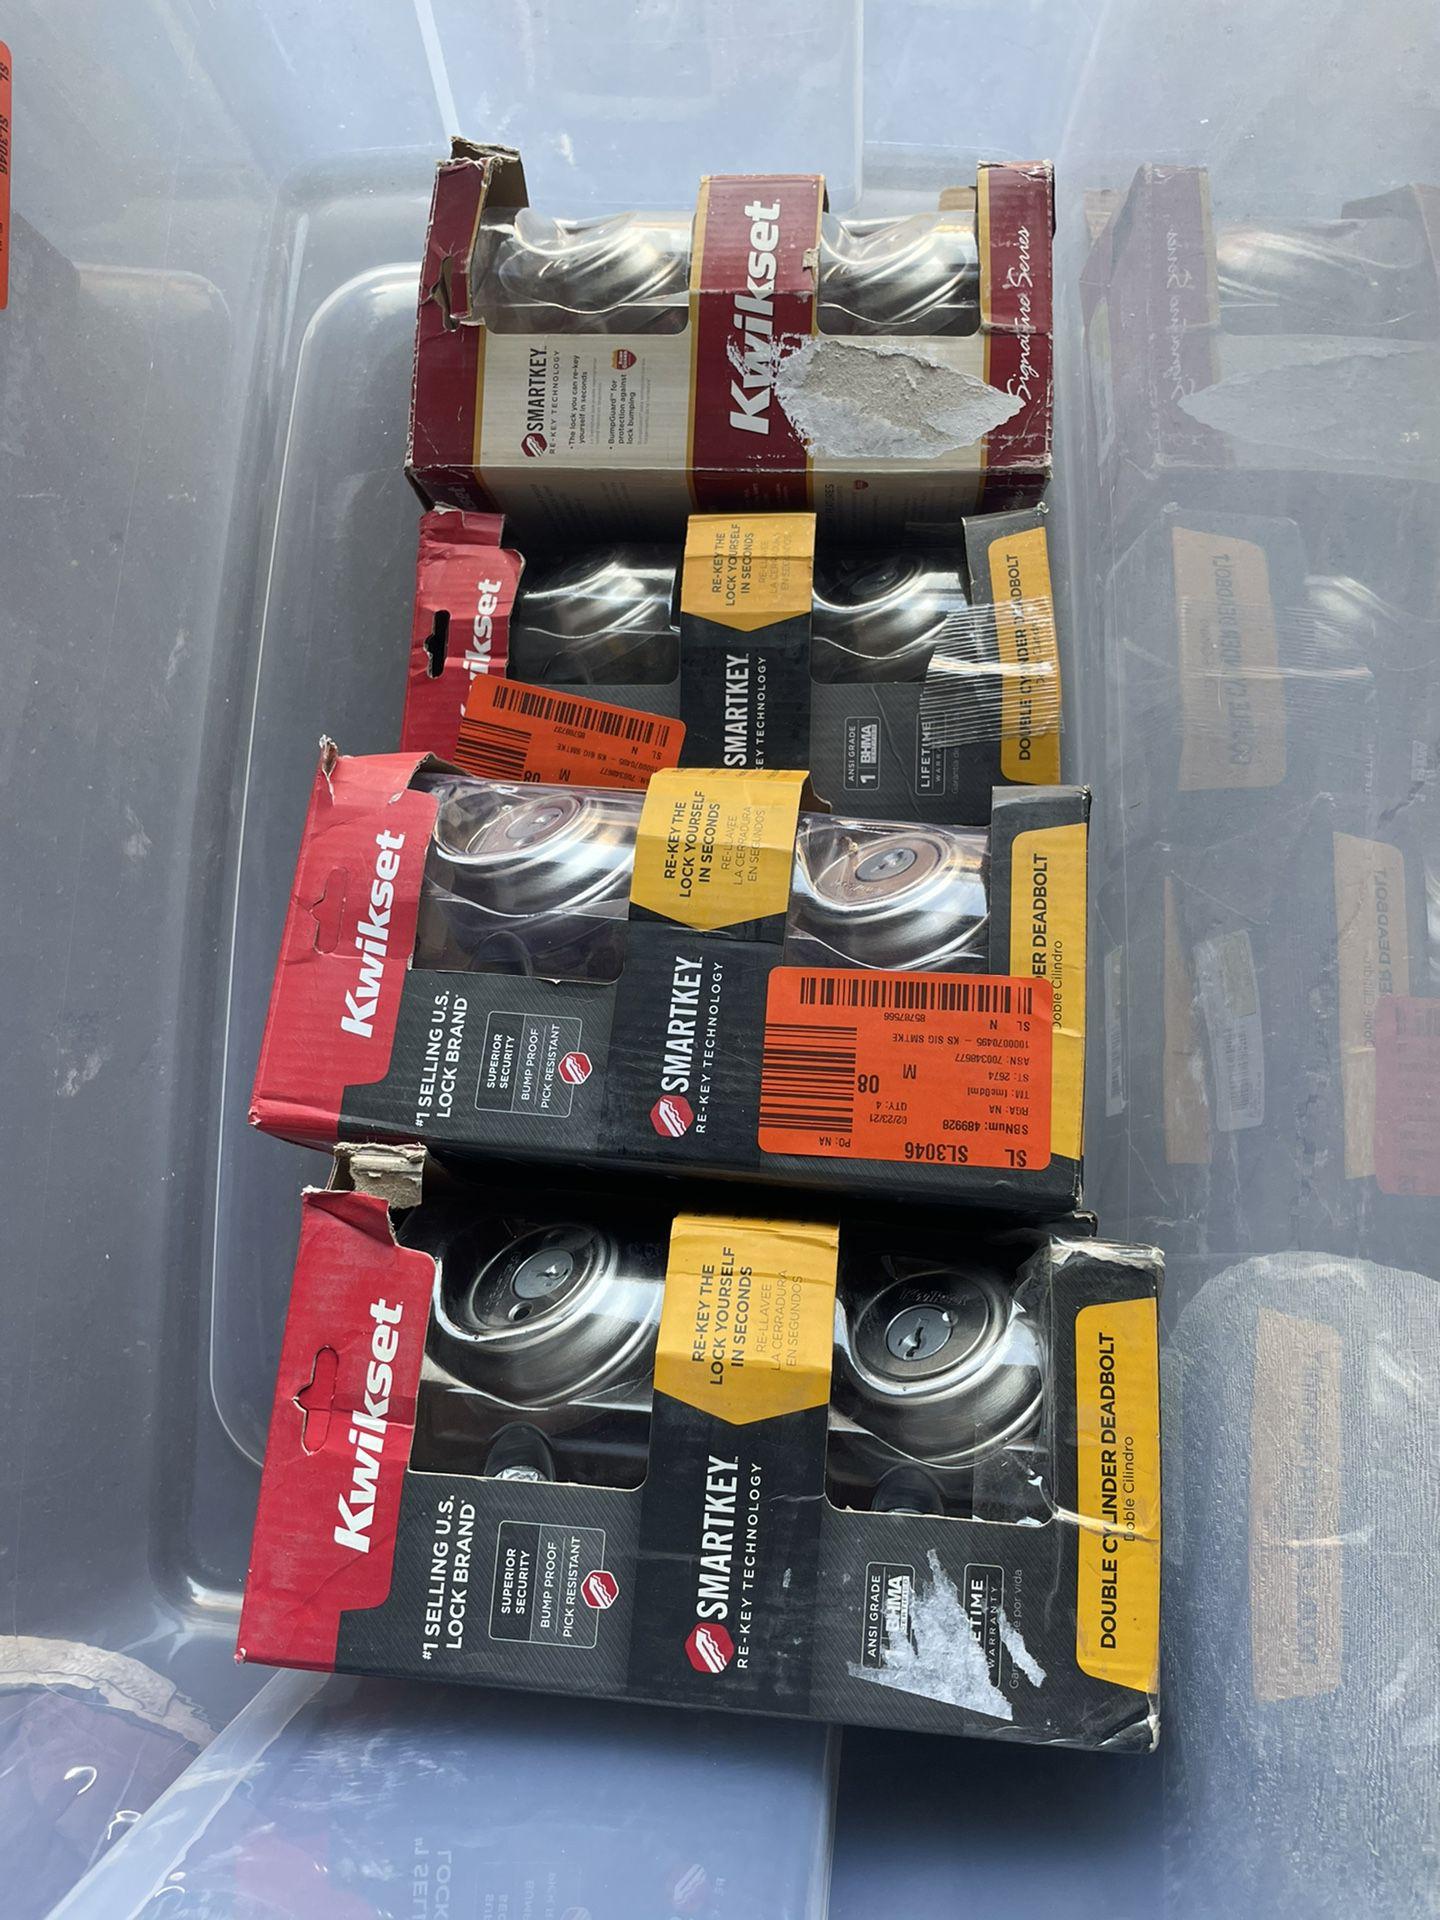 Kwikset 985 Series Satin Nickel Double Cylinder Deadbolt Featuring SmartKey Security